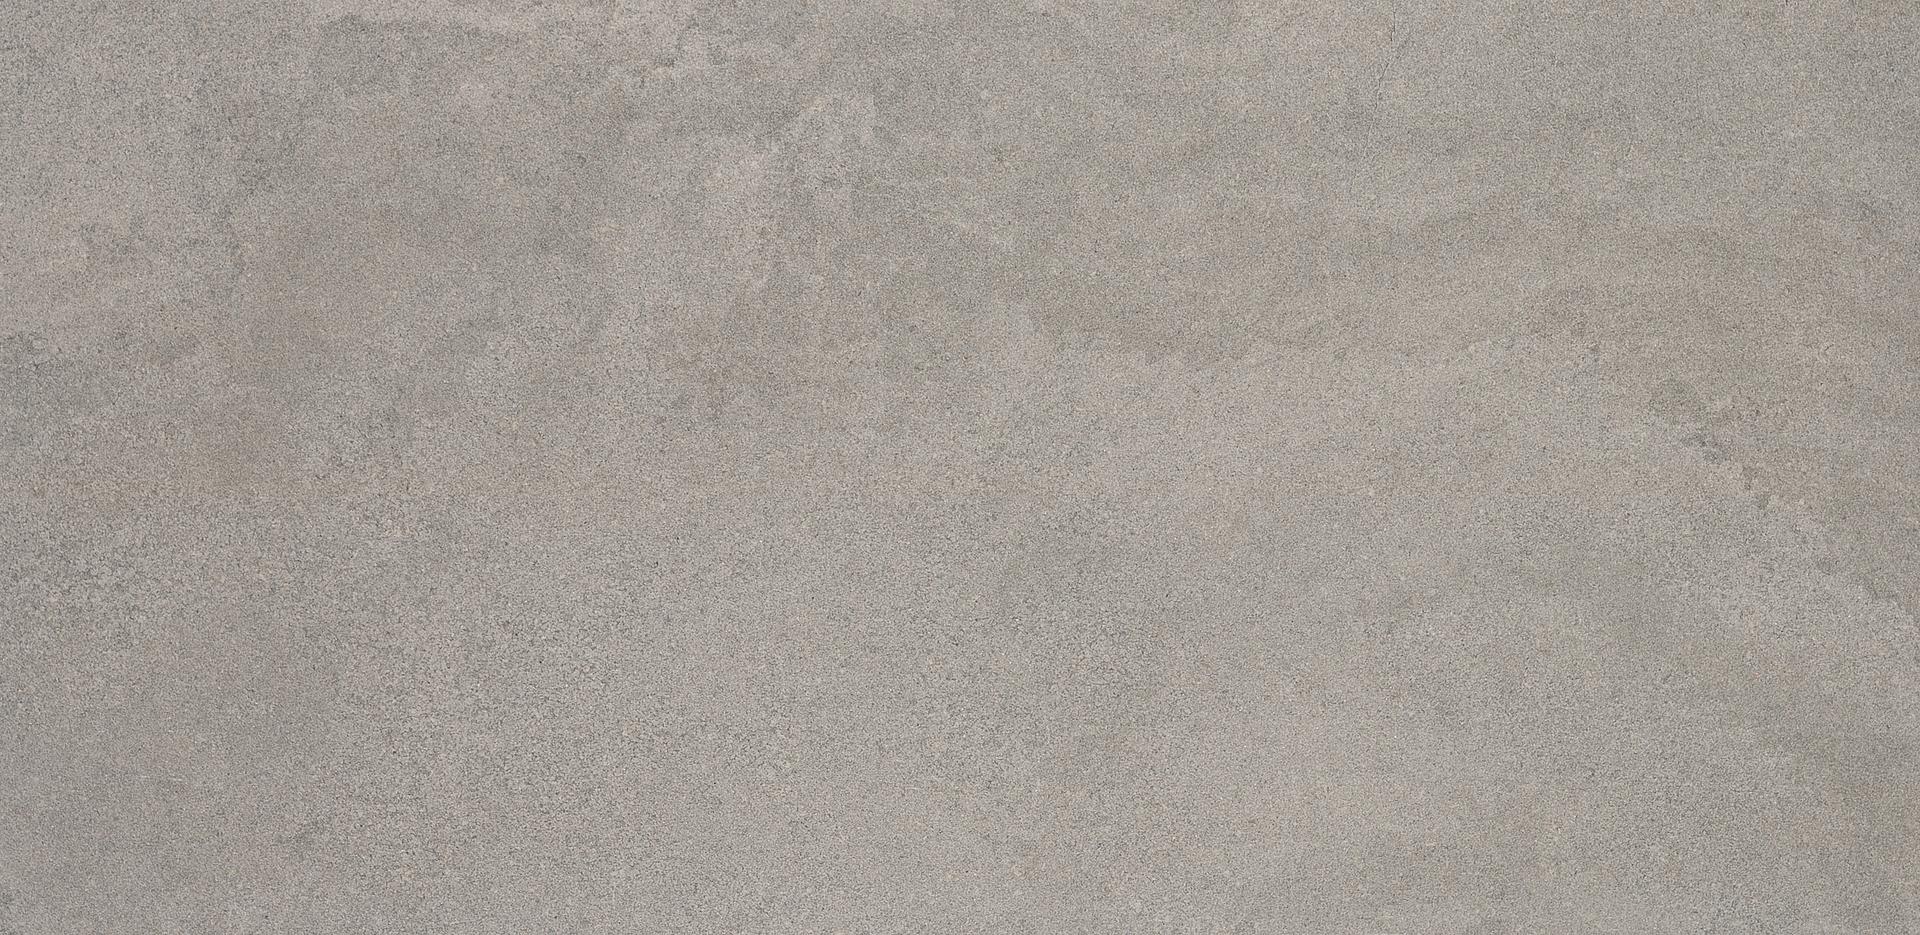 R Stone Project von Ergon Ab €48 in Italien